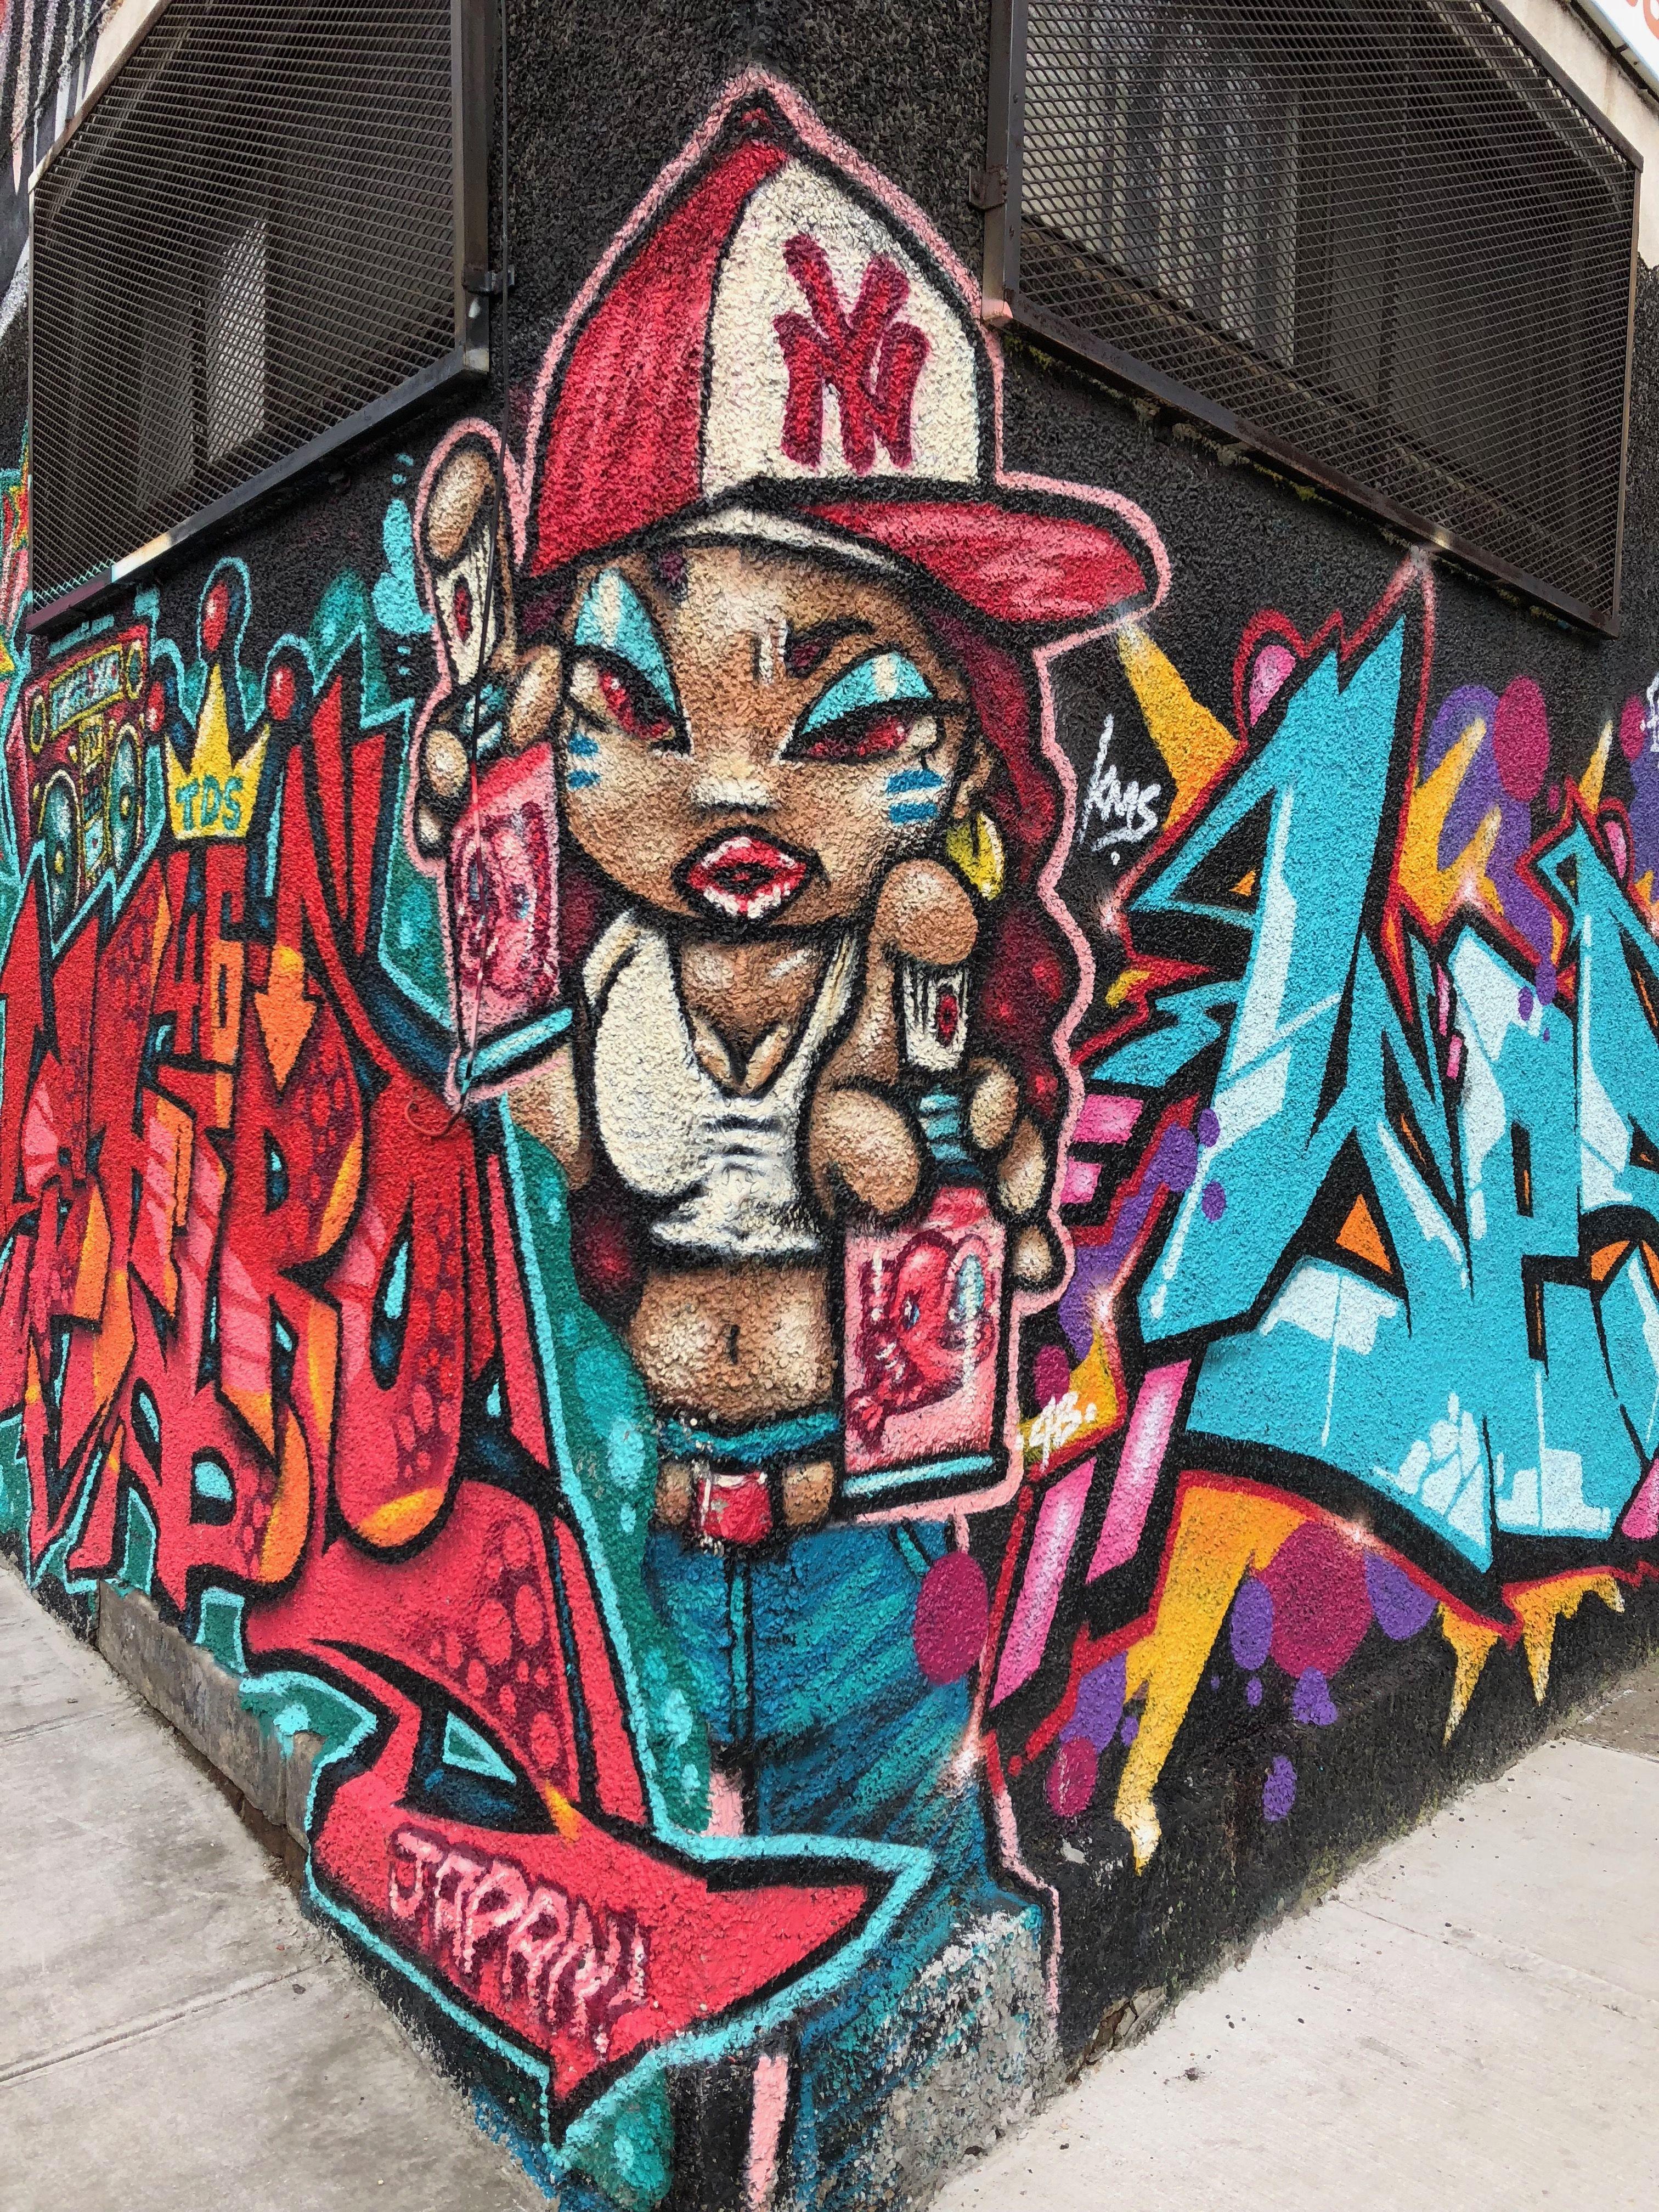 Queens ny murals street art graffiti murals mural art street art graffiti